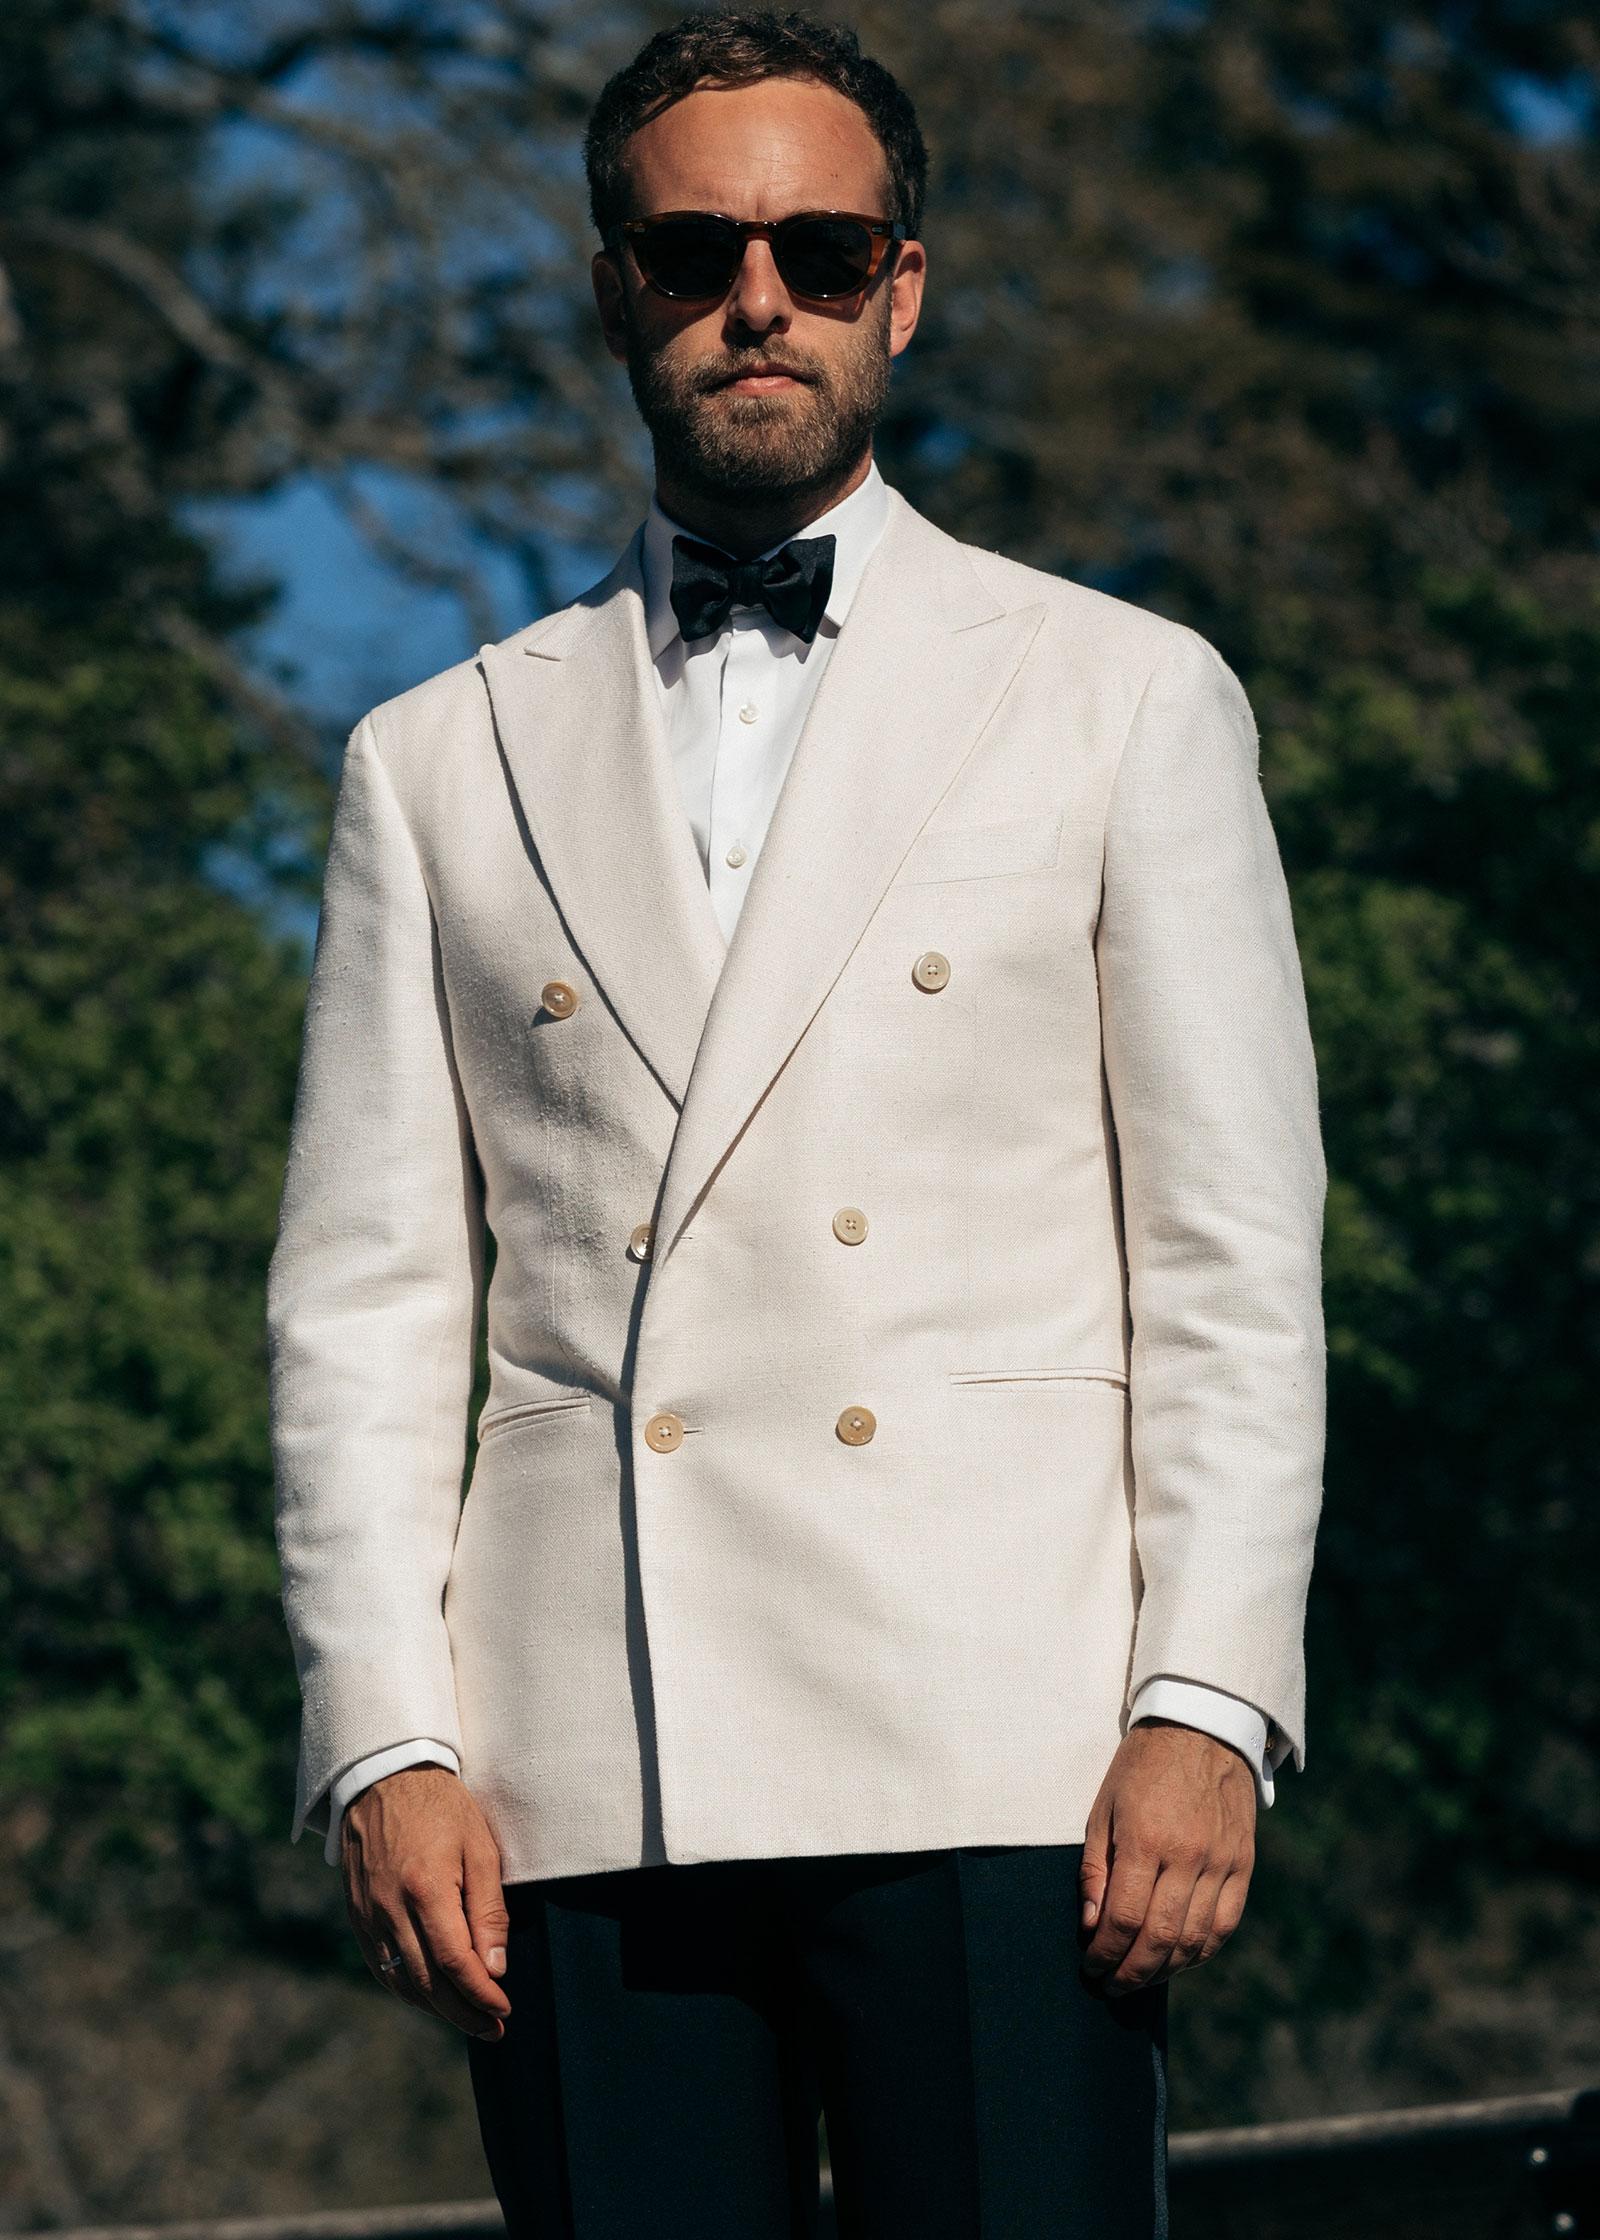 Dress: Mons of Copenhagen